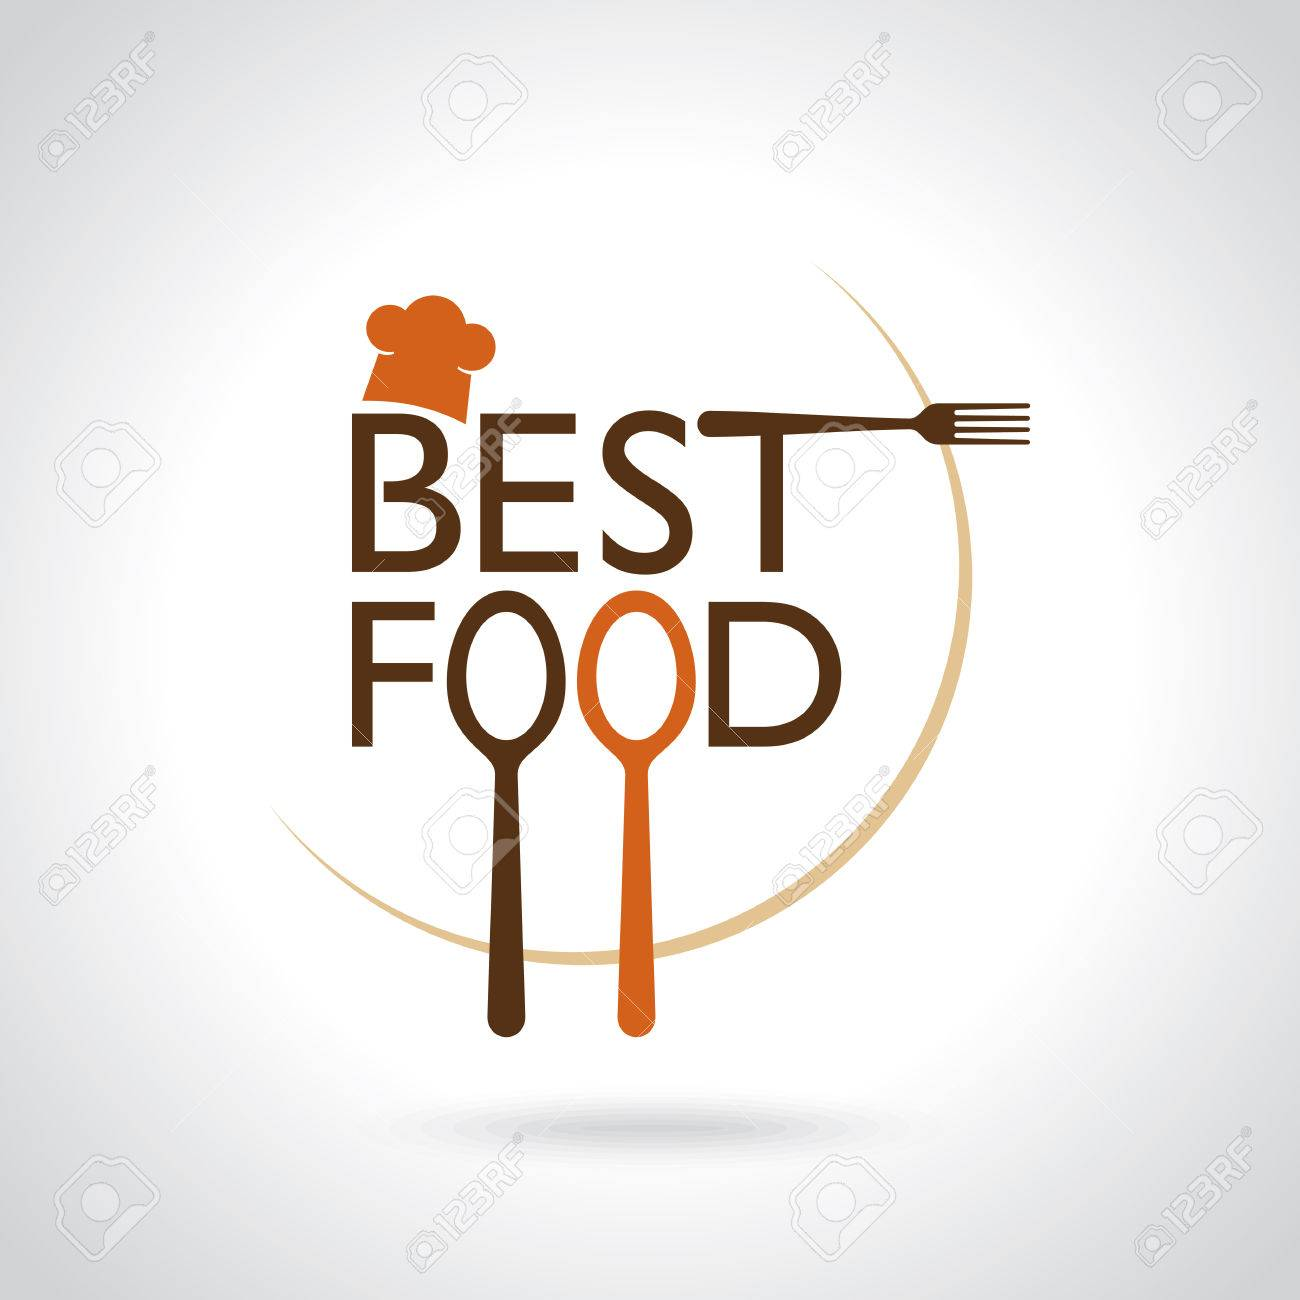 36 of the best restaurant logos for inspiration  99designs